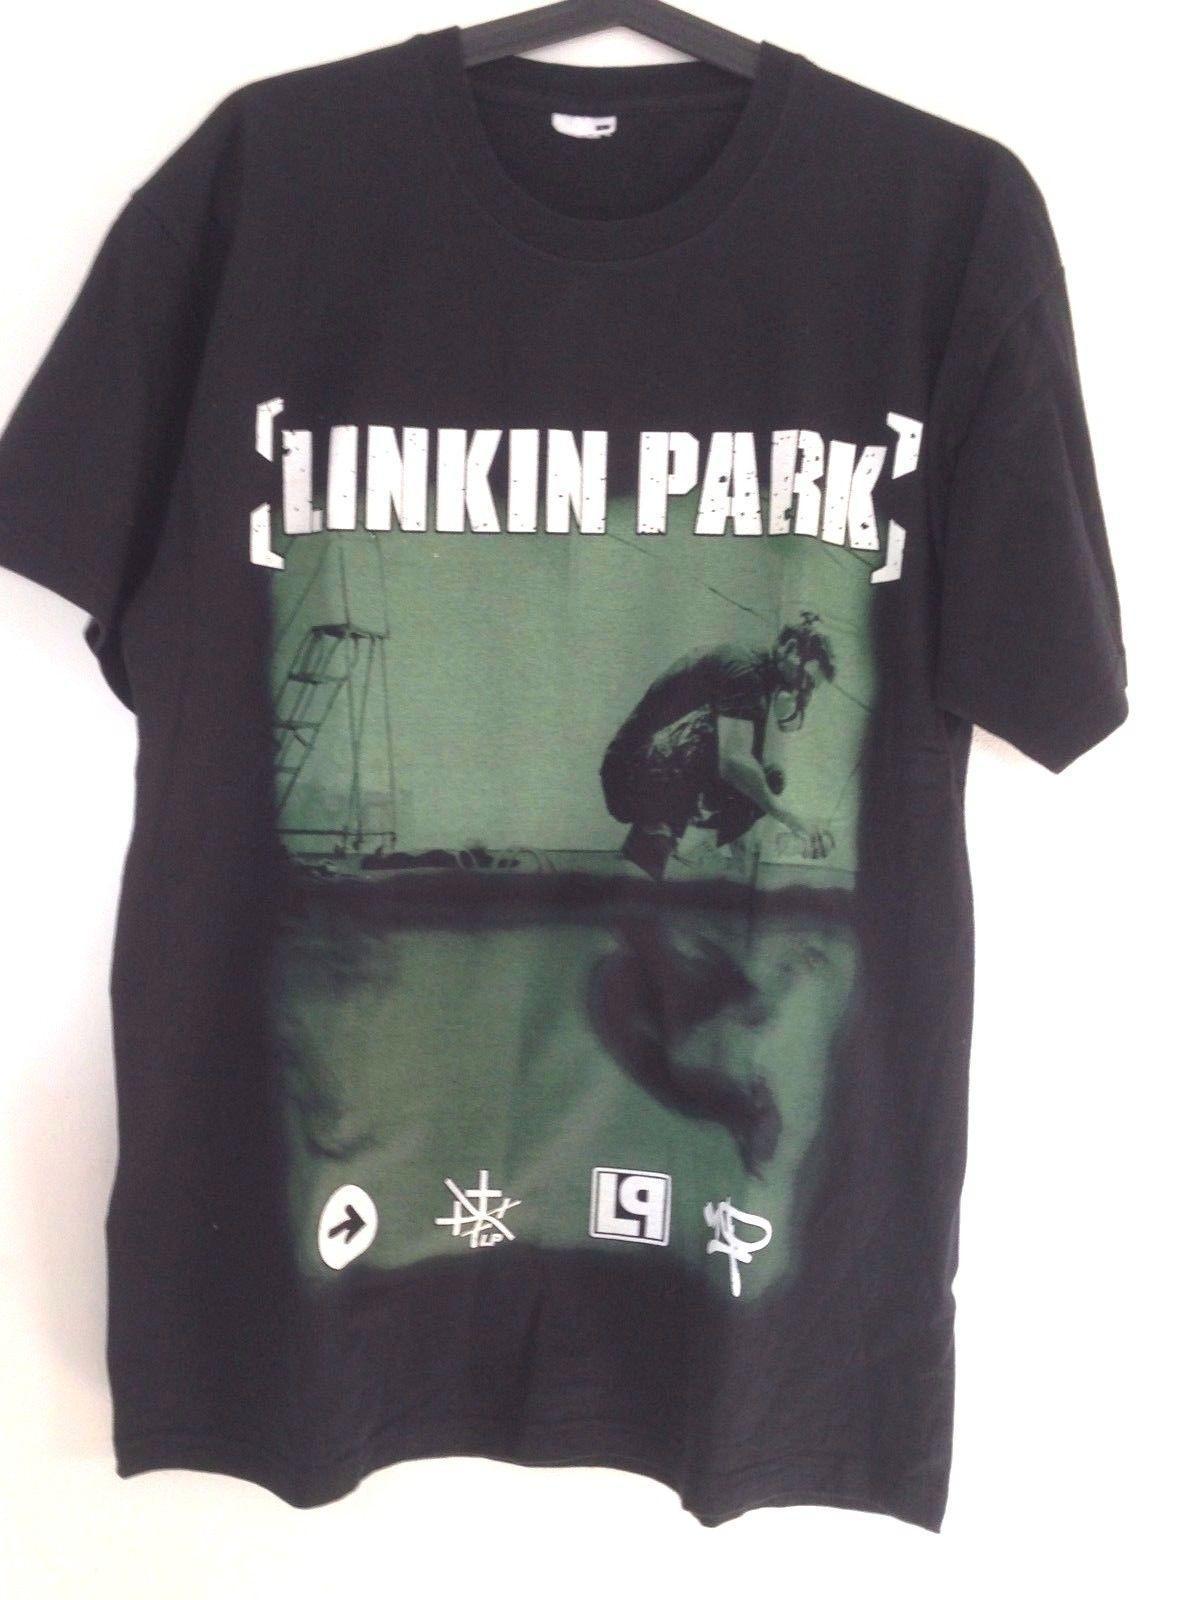 71b3f0941 Rare Linkin Park Meteora T Shirt Black Men S Size L Clothing Chester  Bennington Best Sites For T Shirts Tee Shirt Deals From Yuxin04